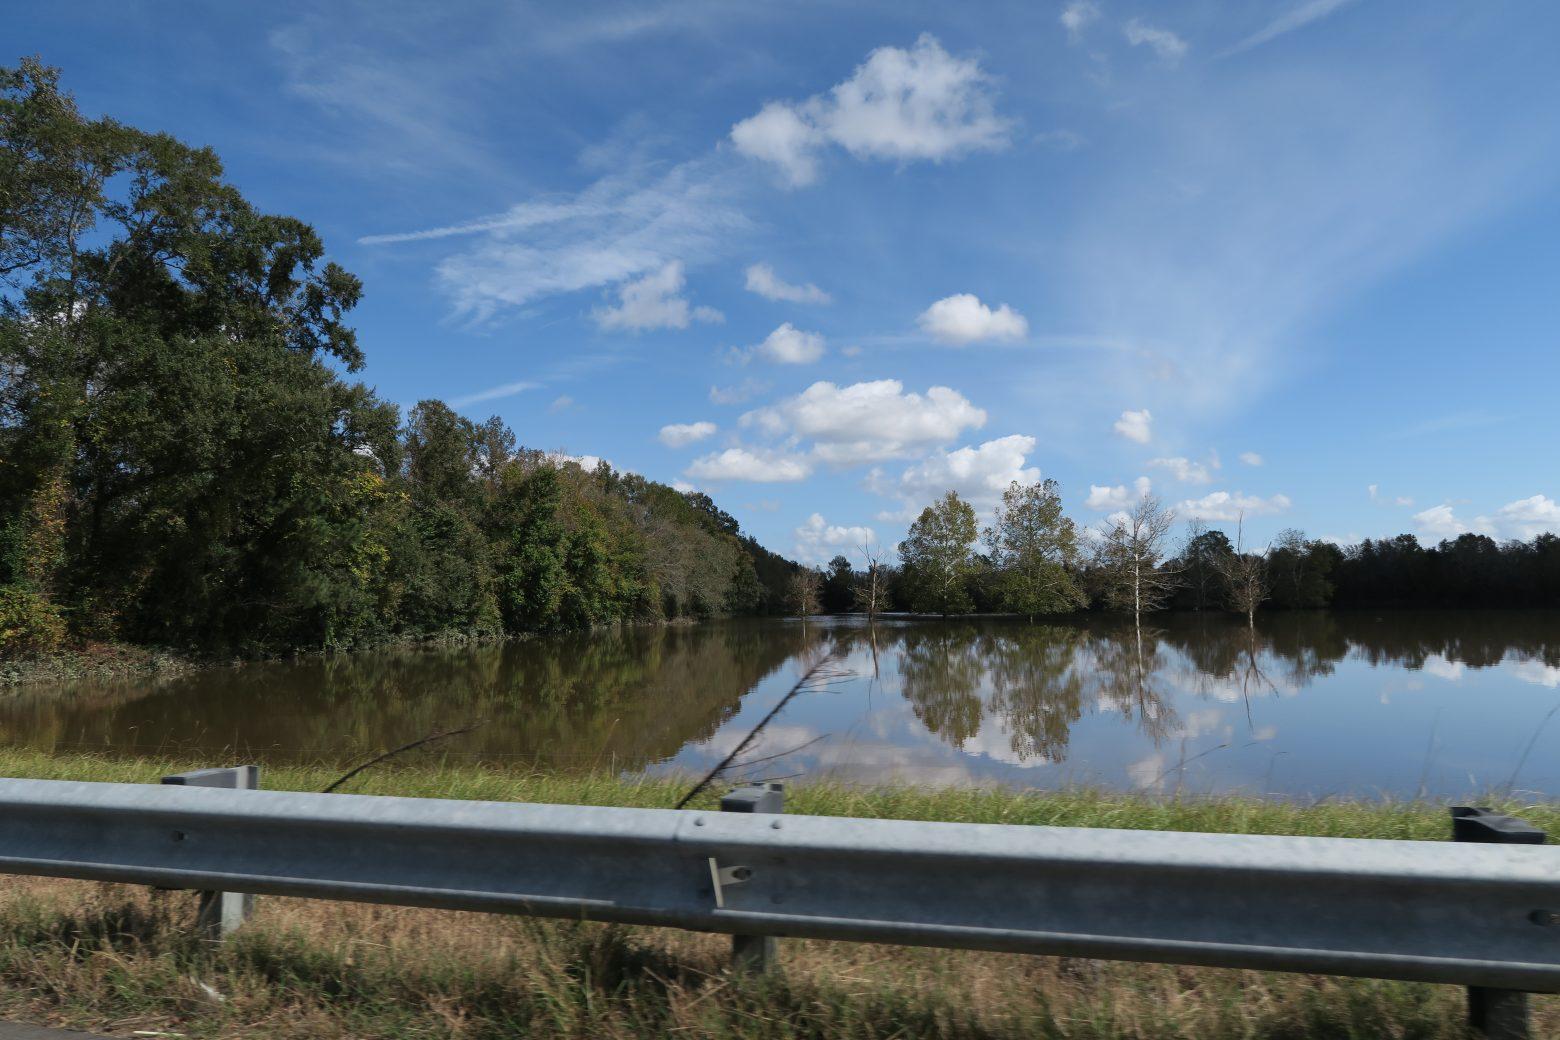 Wayne County Flooding 10.10.16 (40)